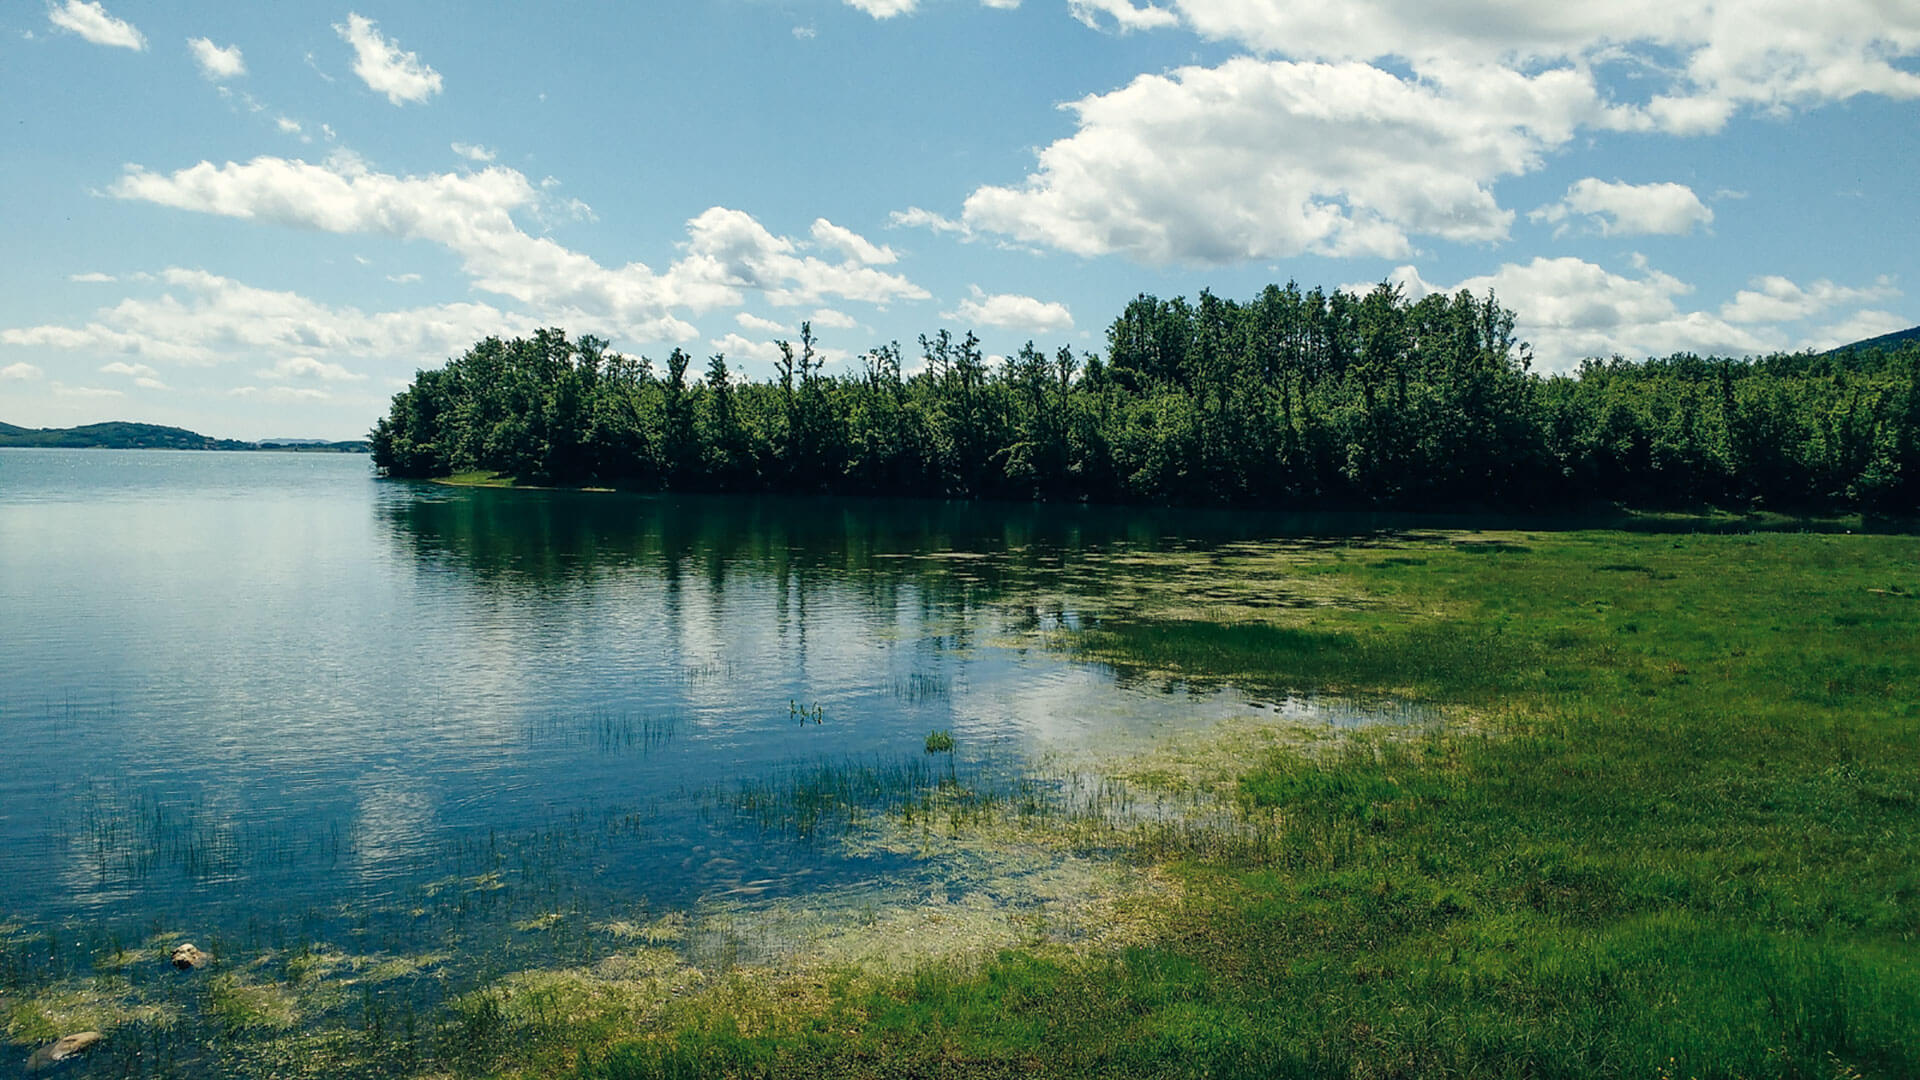 plastira-lake-greece-la-vie-en-blog-all-rights-reserved-7